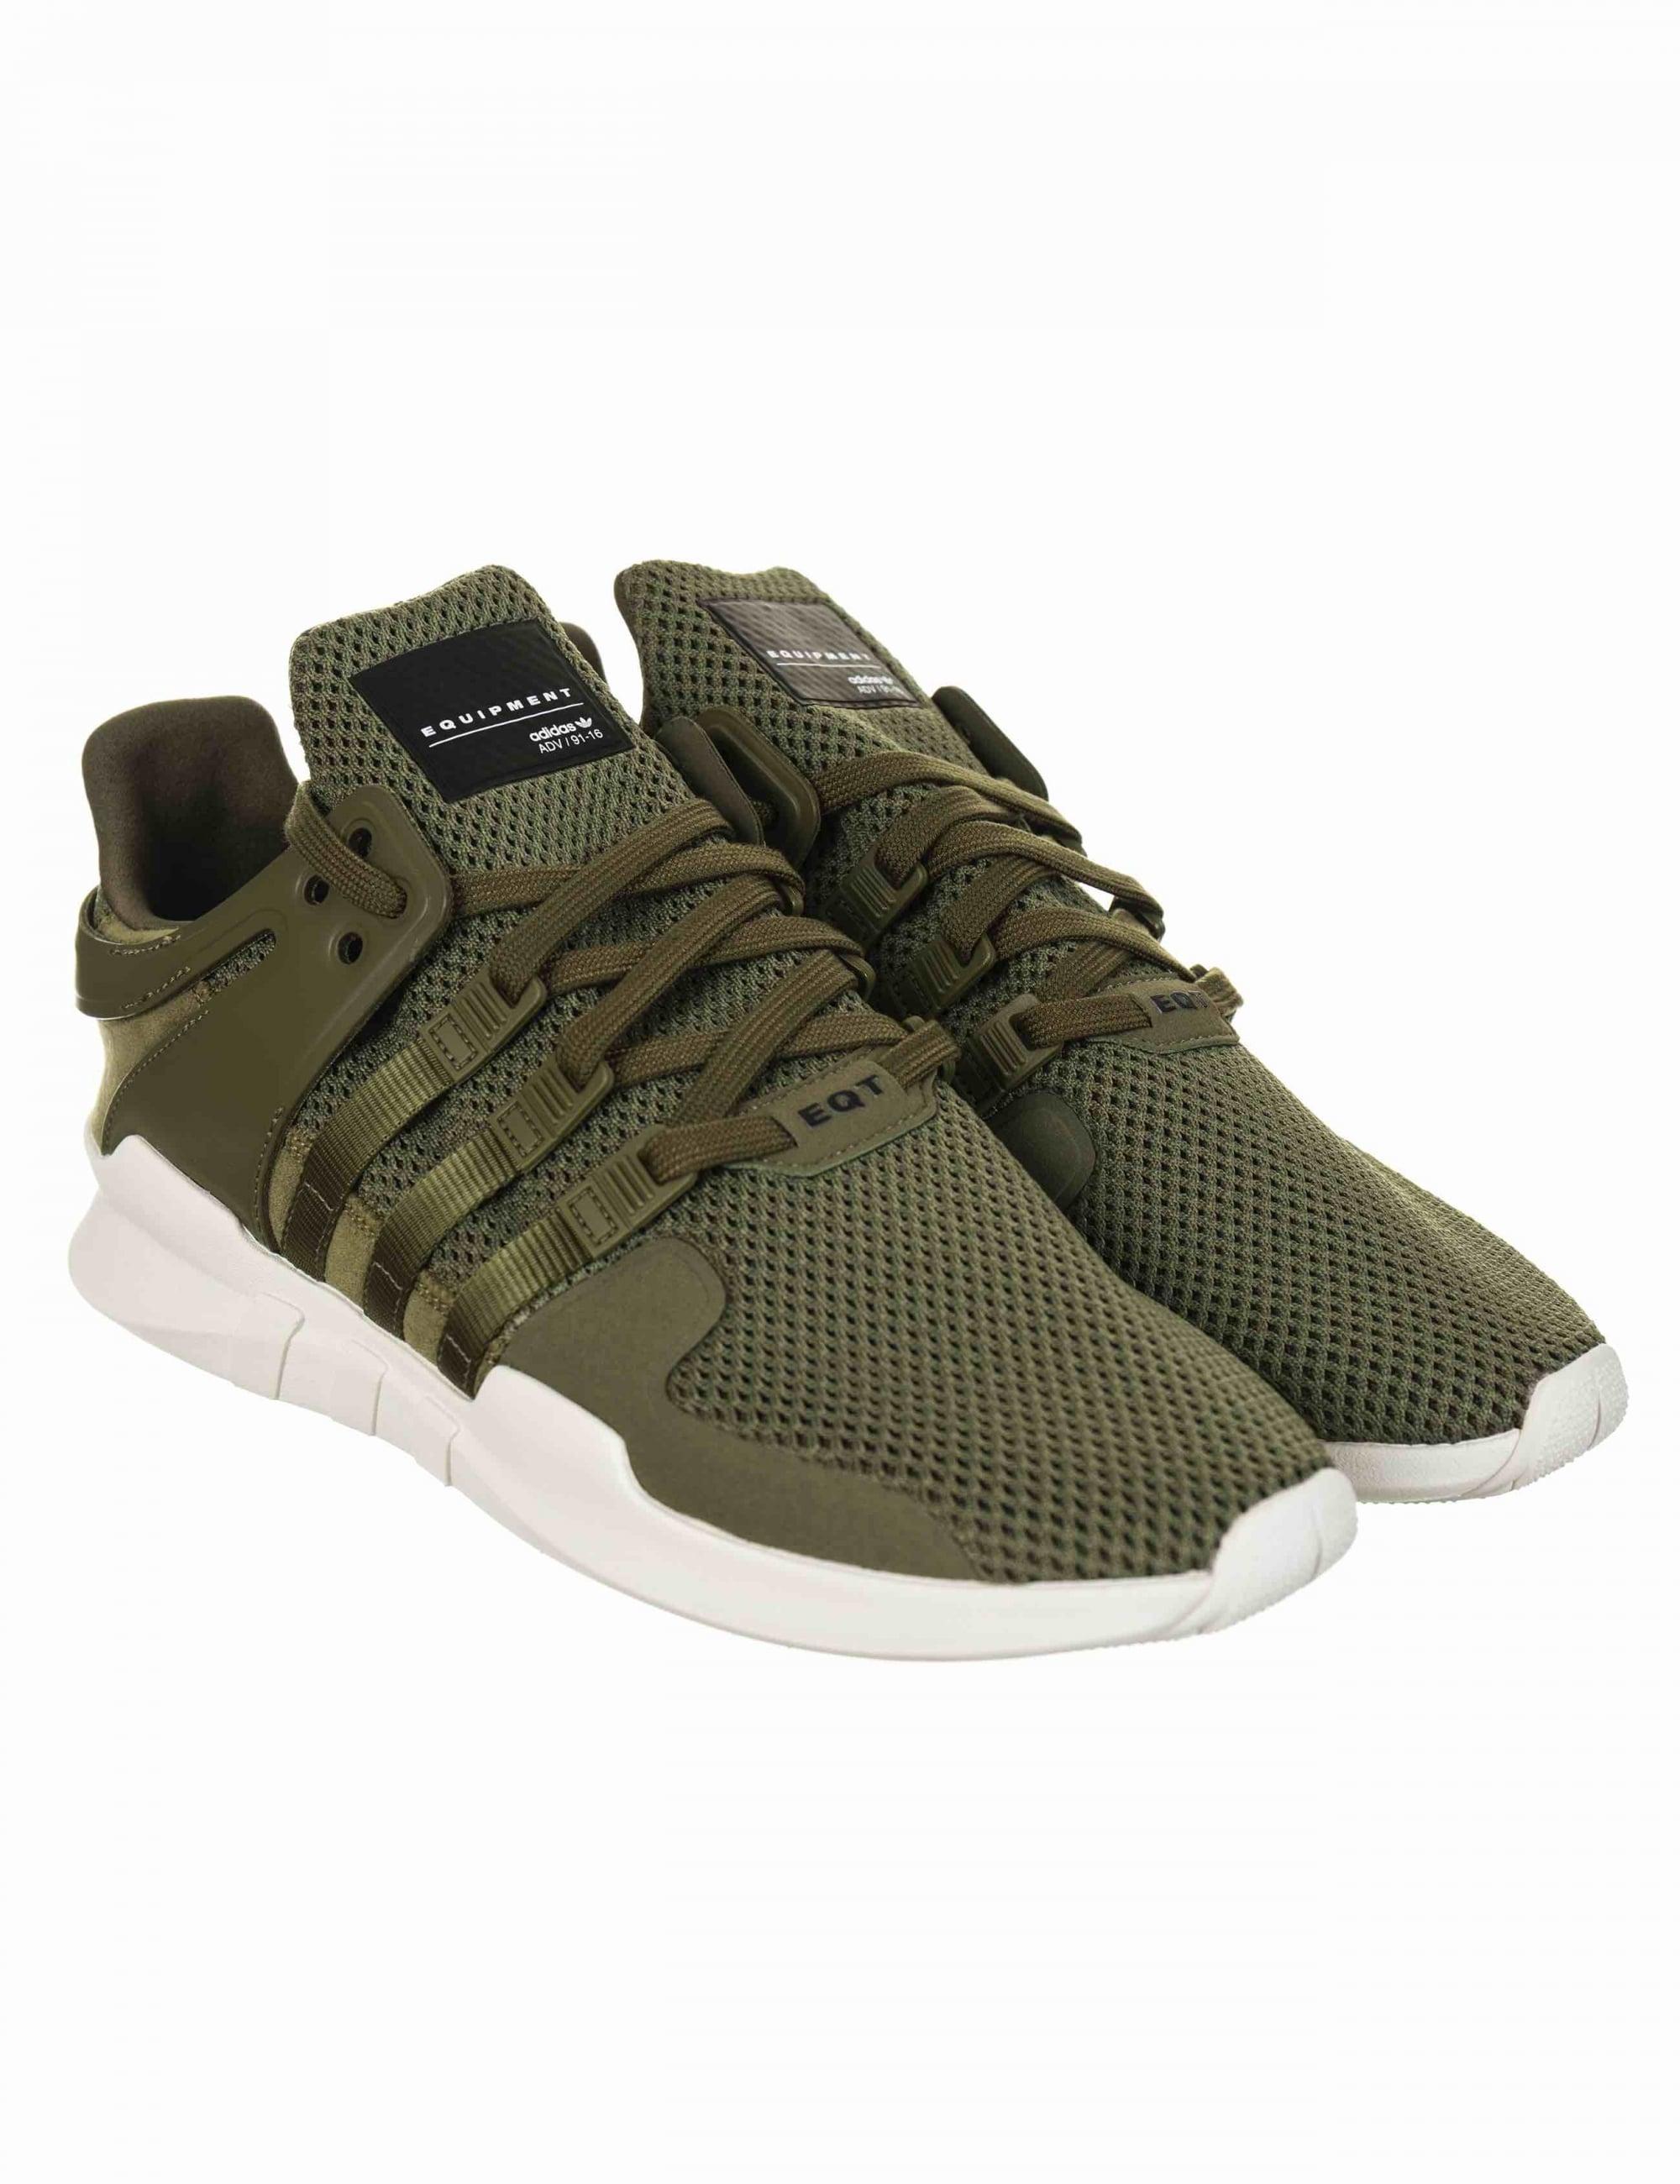 EQT Support Advance Shoes - Olive Cargo (BA8328)